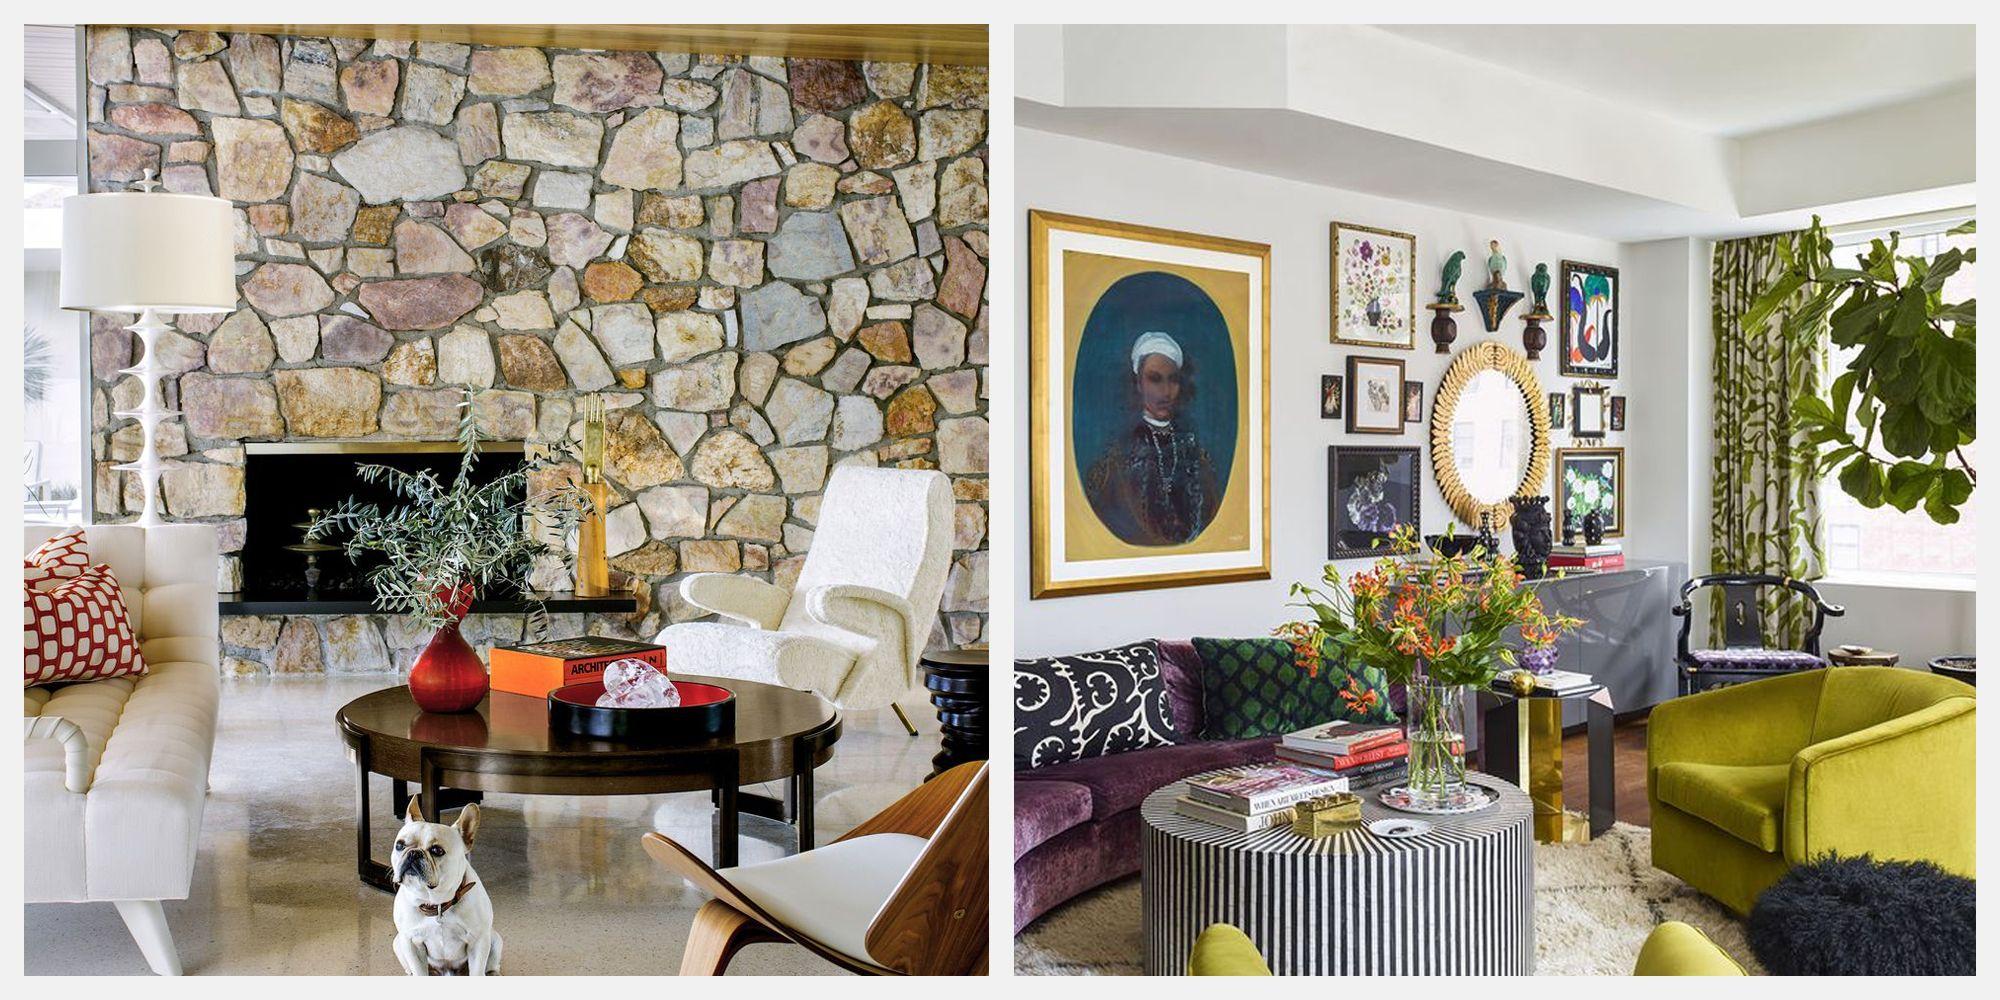 70s living room ideas - gorgeous 70s living room decor